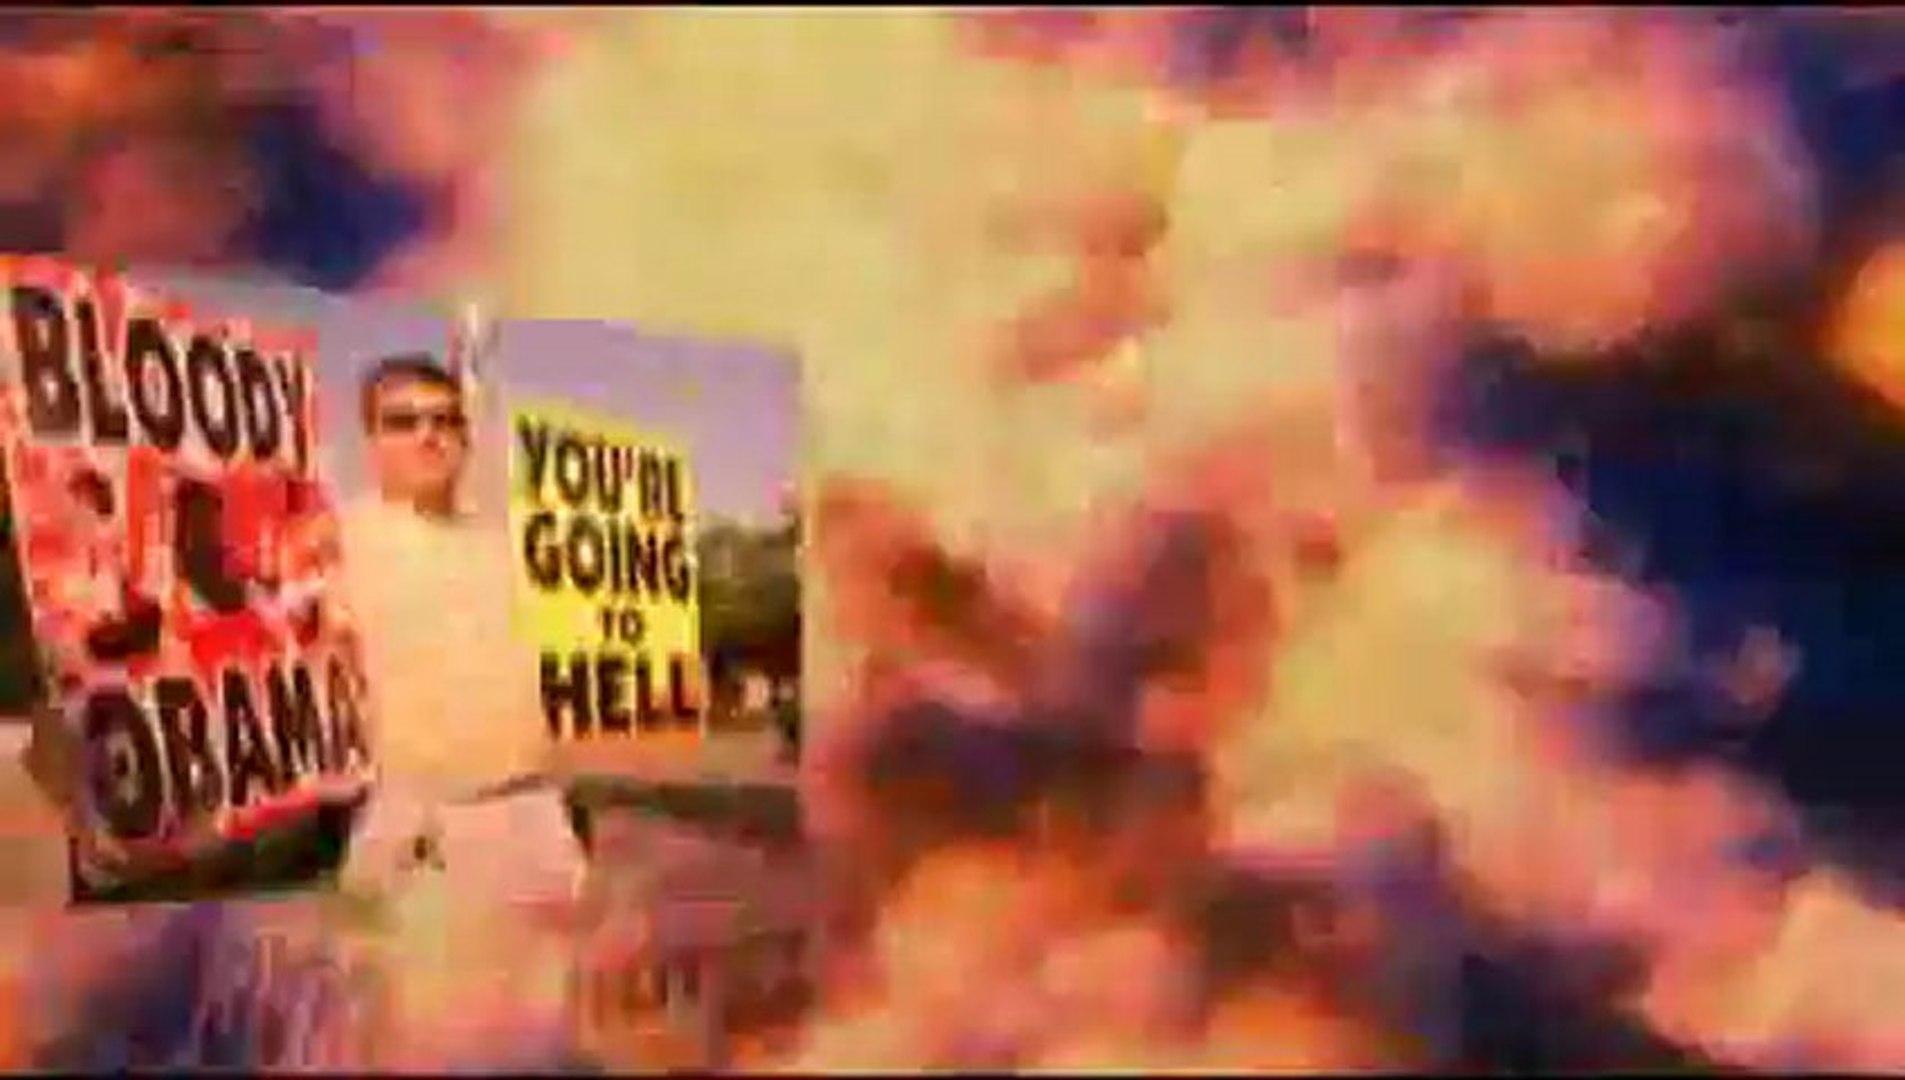 westboro parodies Death Cab For Cutie's Grapevine Fires